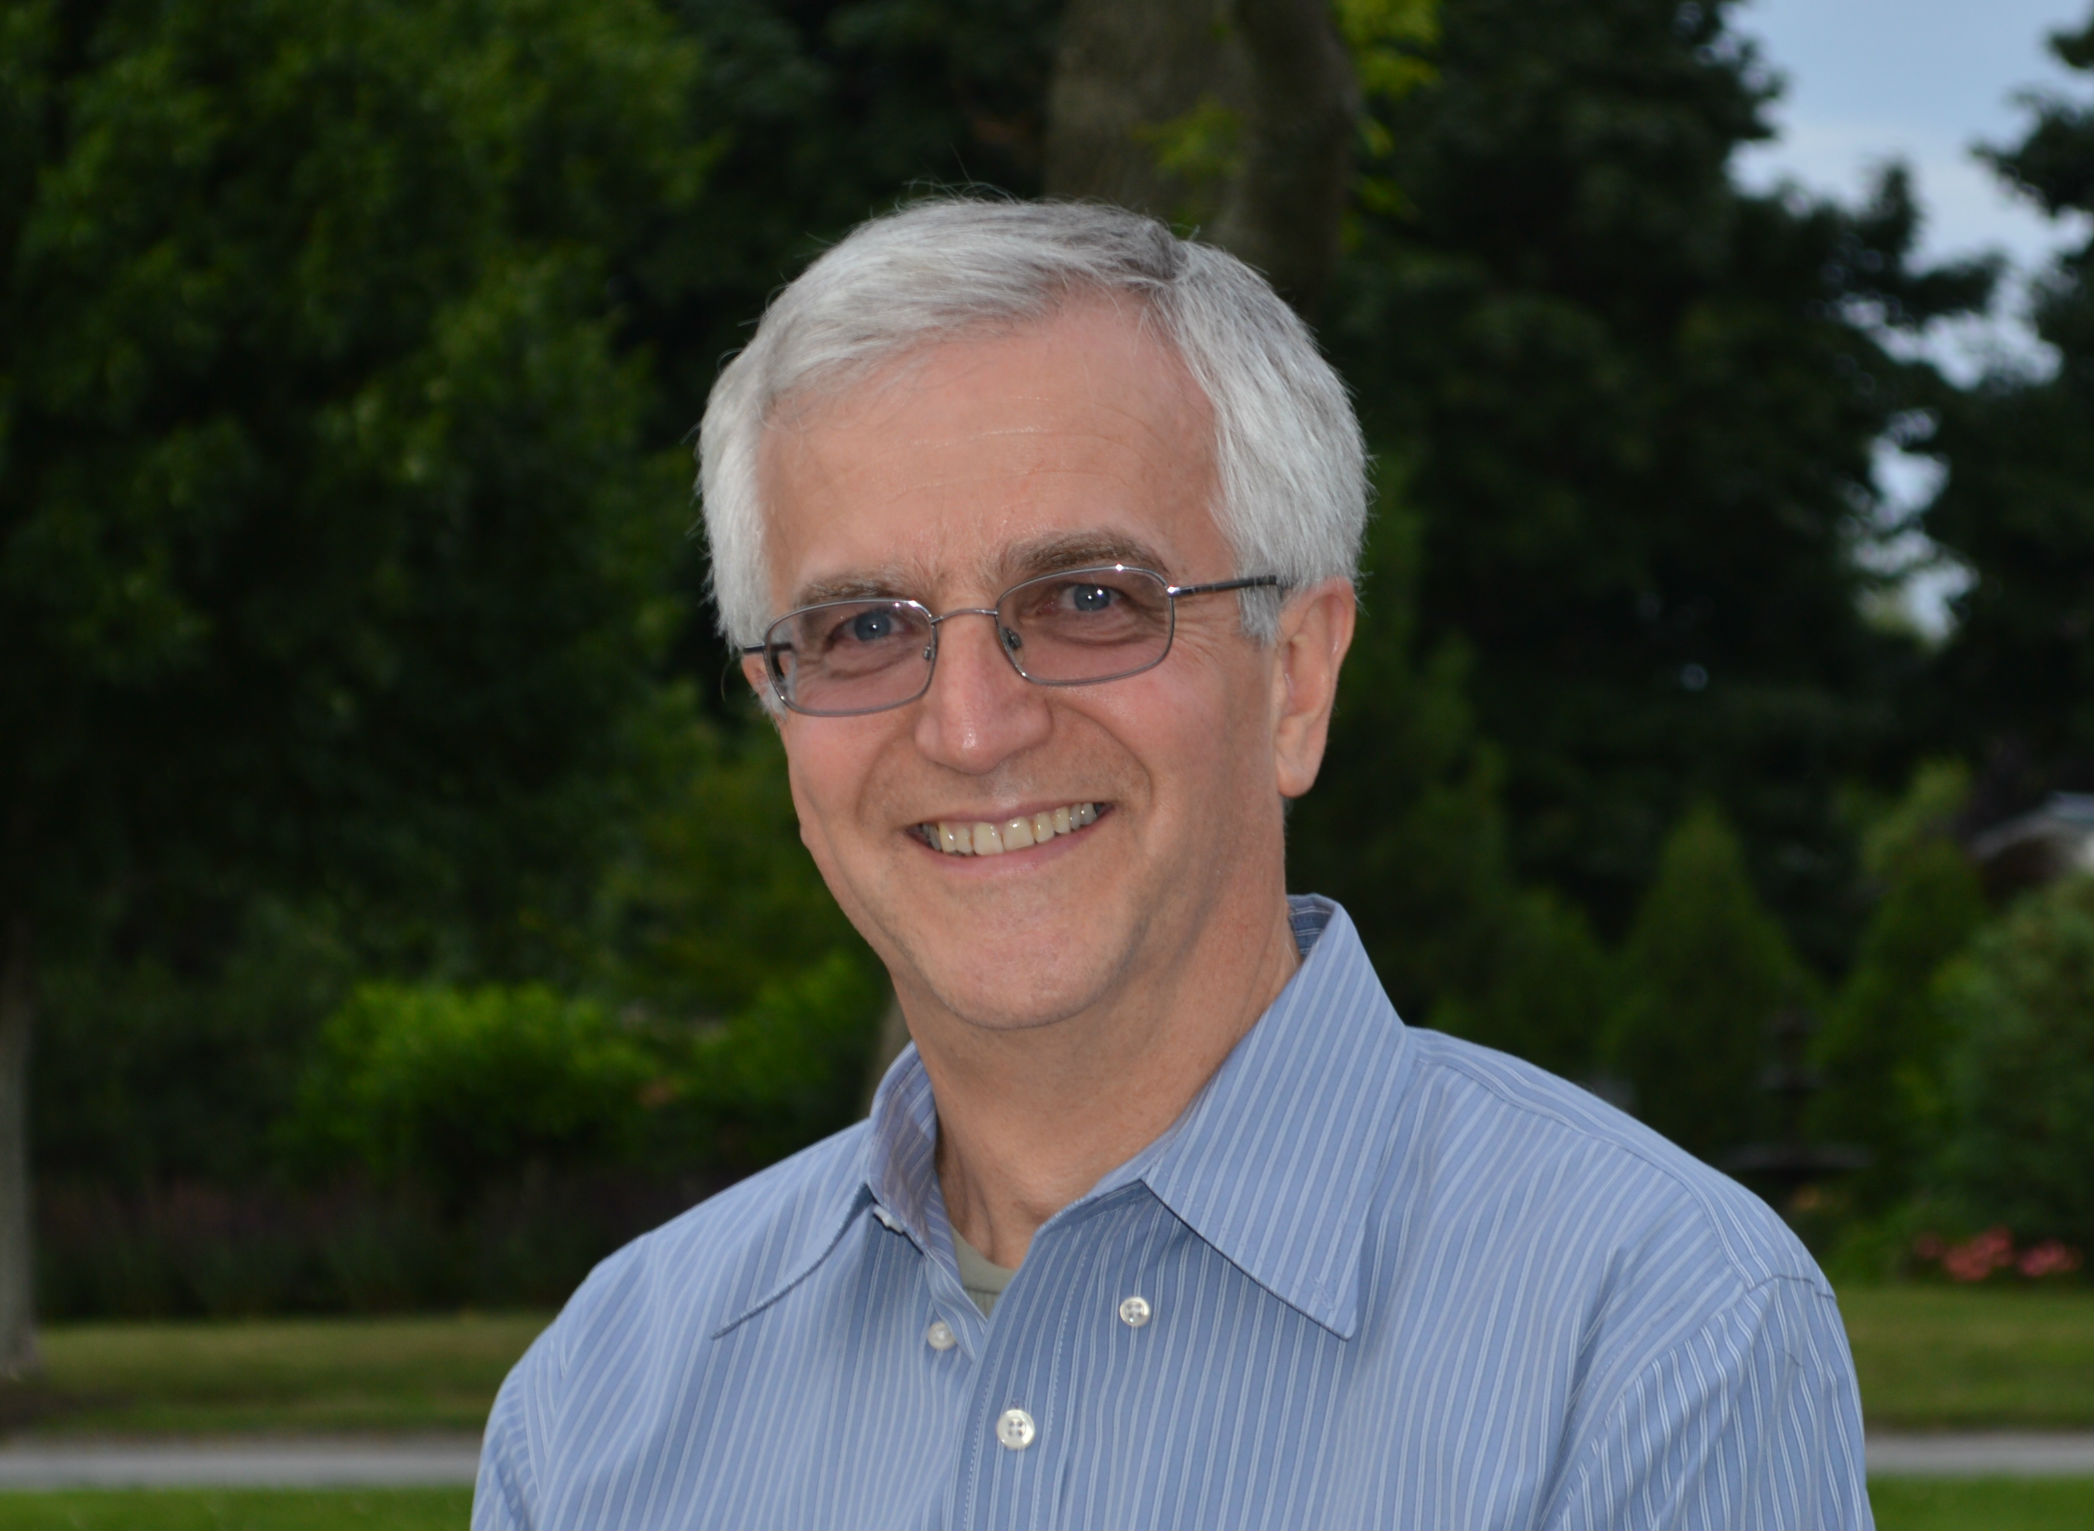 Bruce Brauninger-July 2014 Headshot (1).jpg